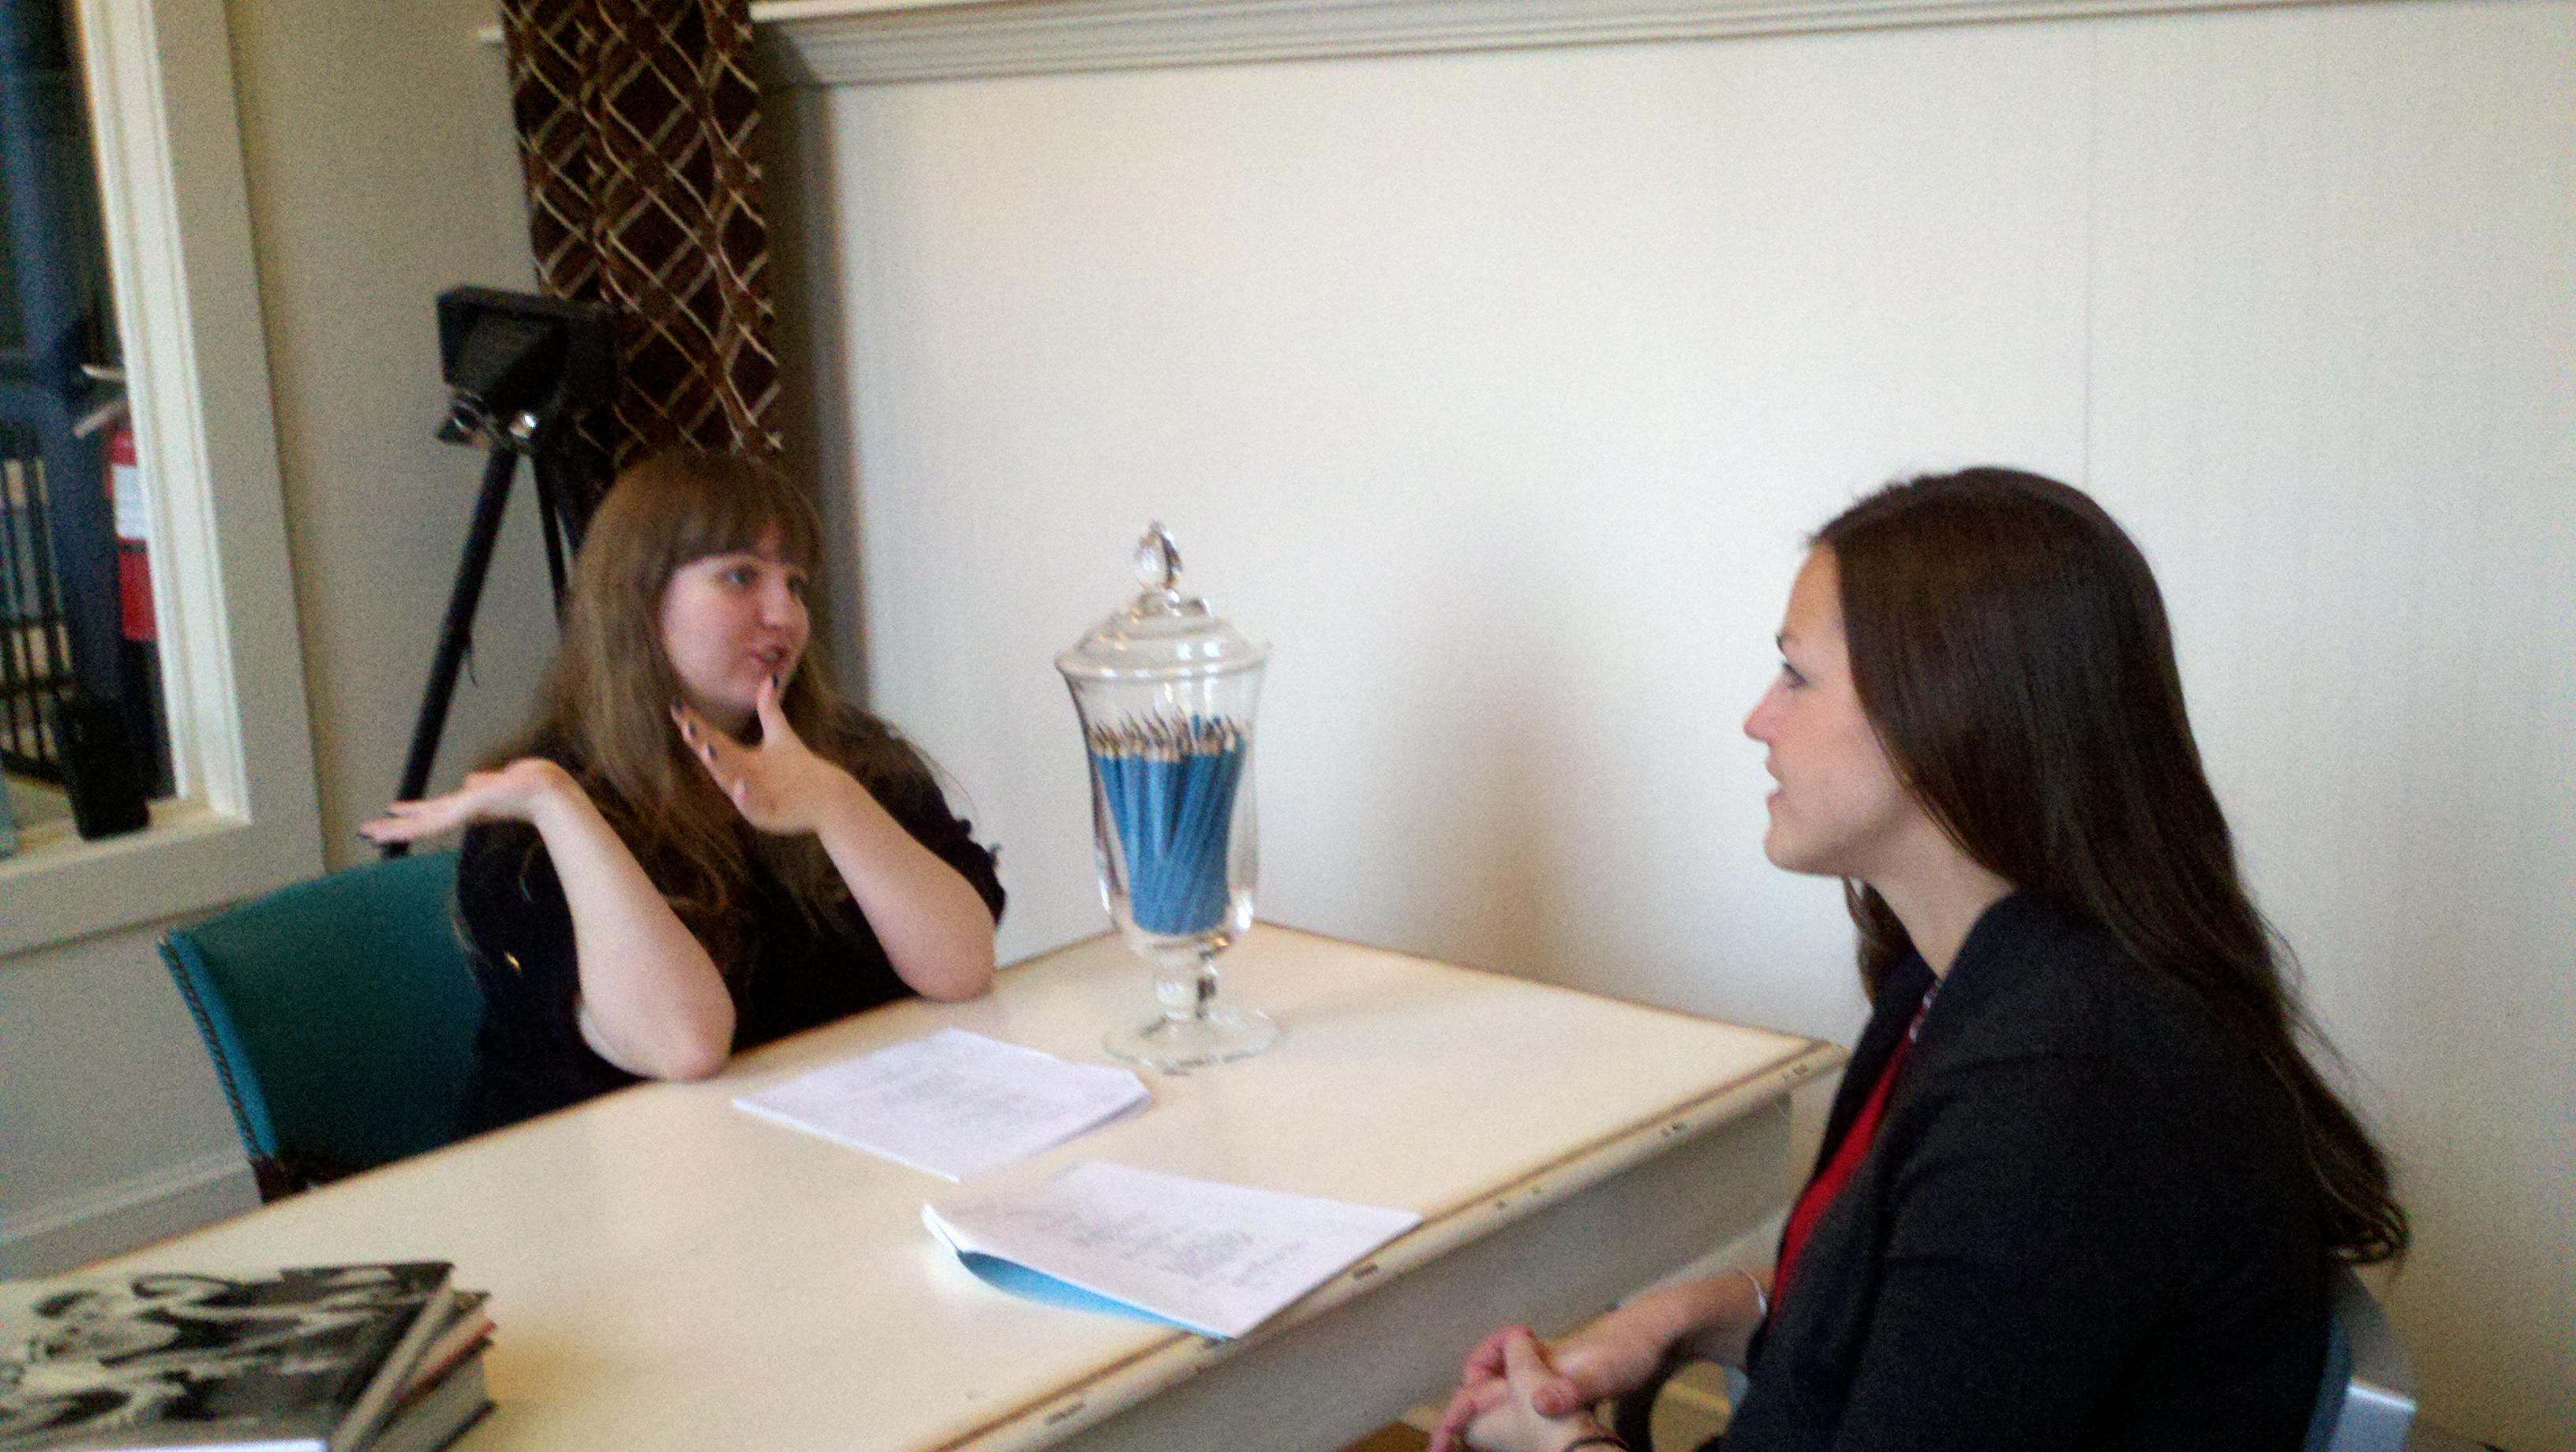 (Anna Lantz) gets interesting insights in her information interview